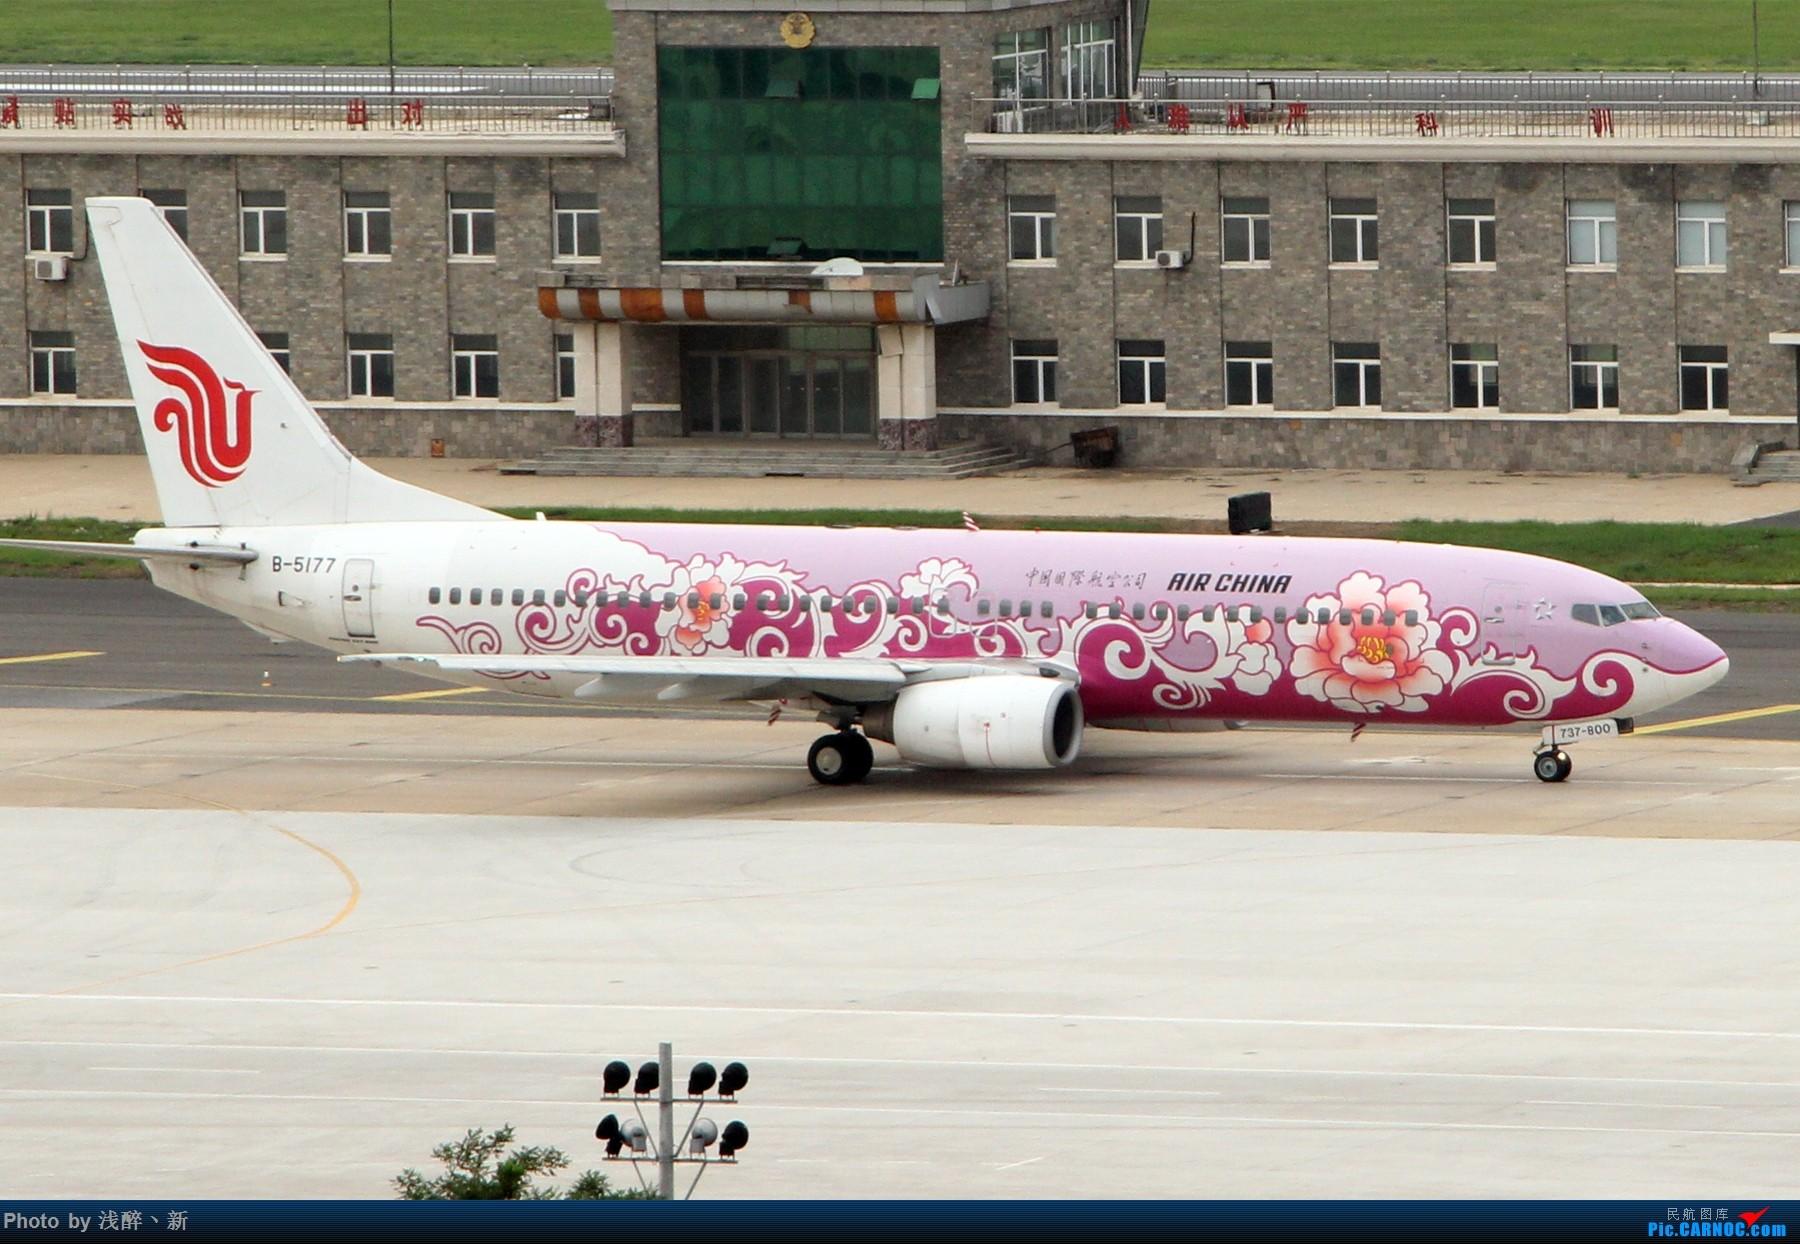 Re:[原创]DLC 7.16 机场游击战 BOEING 737-800 B-5177 中国大连国际机场